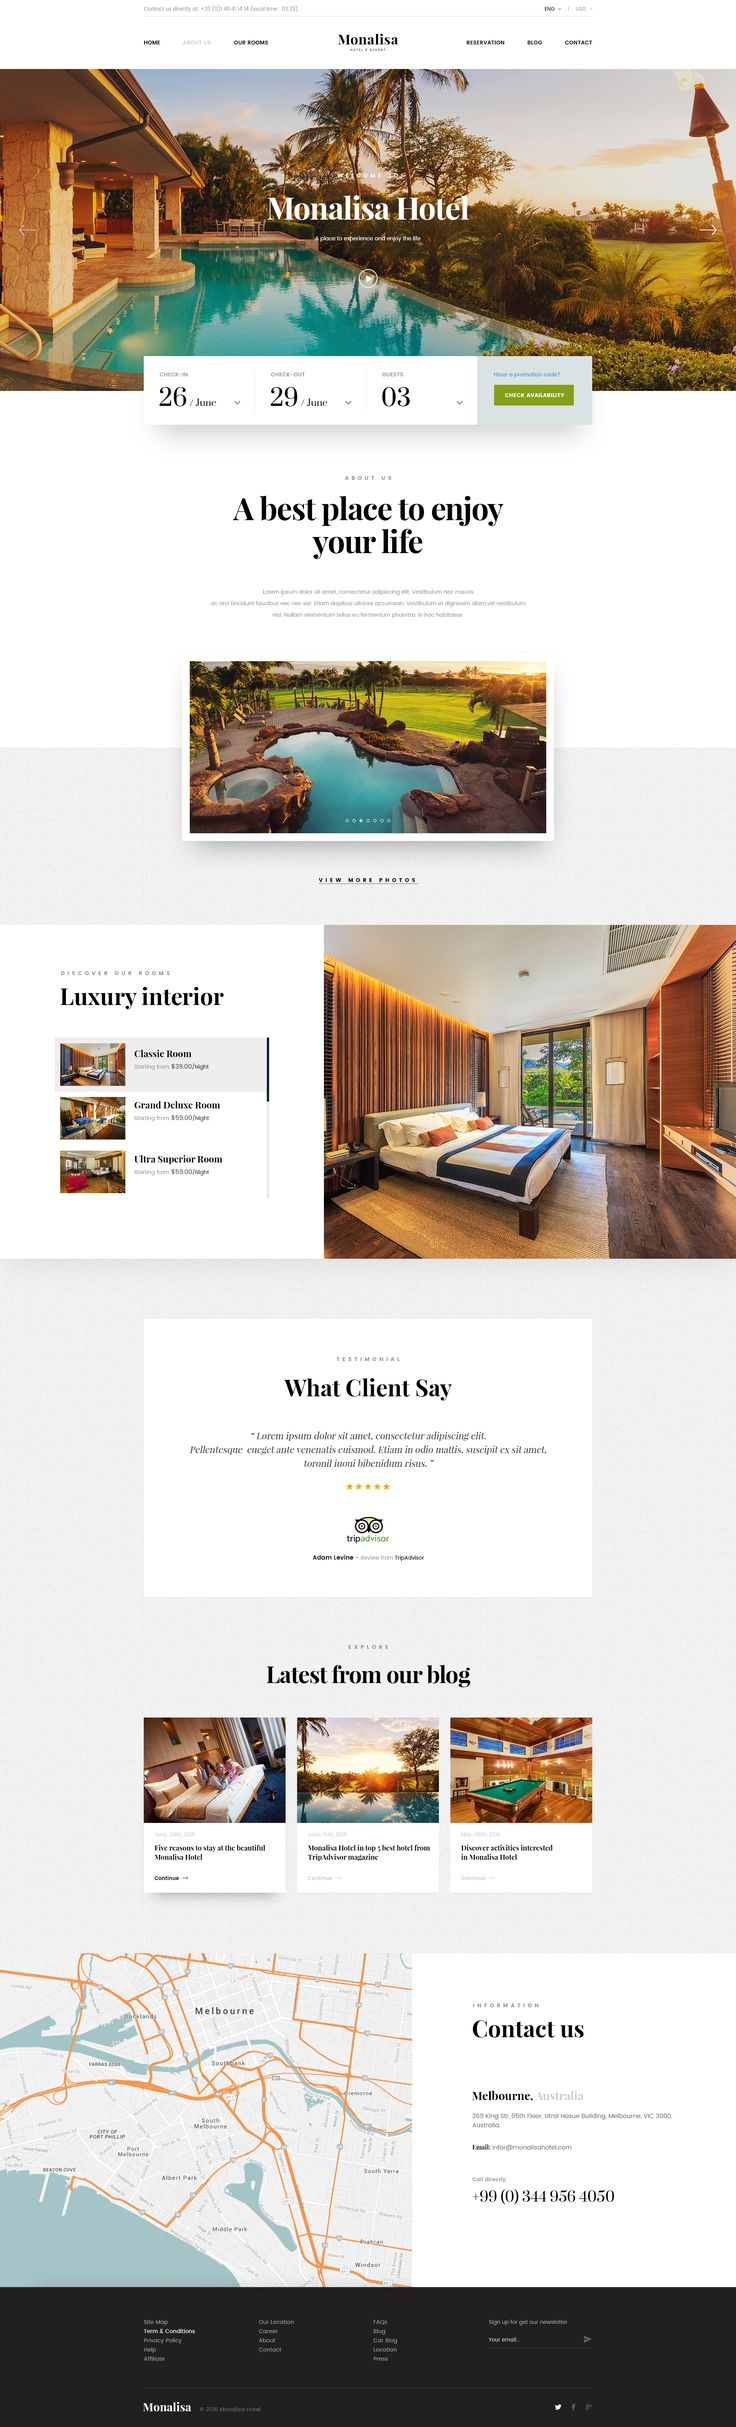 Dribbble - home.jpg by C-Knightz Art 호텔예약날짜가 가장 중요시 되는 사용자 요구로 인해 날짜를 기반으로 예약할 수 있는 홈피 시스템을 선보이고 있다.